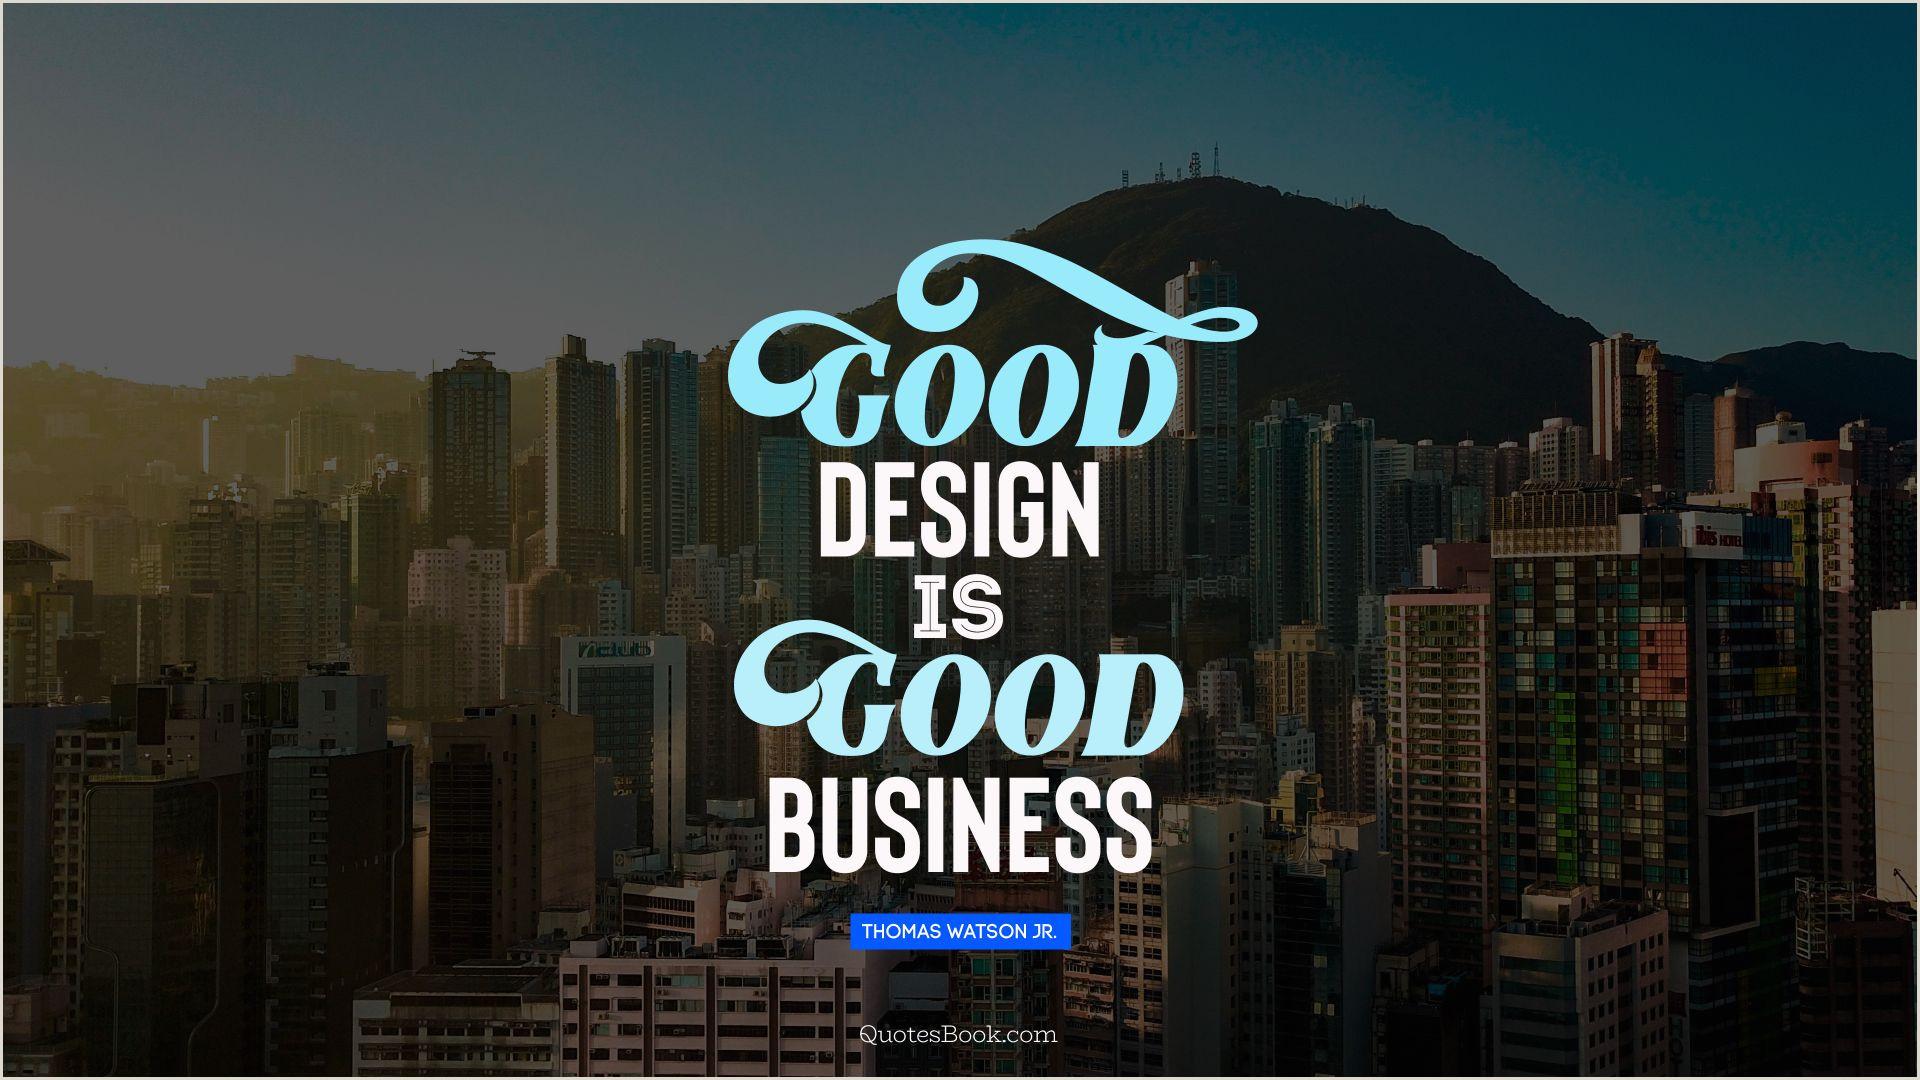 Good Design Is Good Business Quote Good Design Is Good Business Quote By Thomas Watson Jr